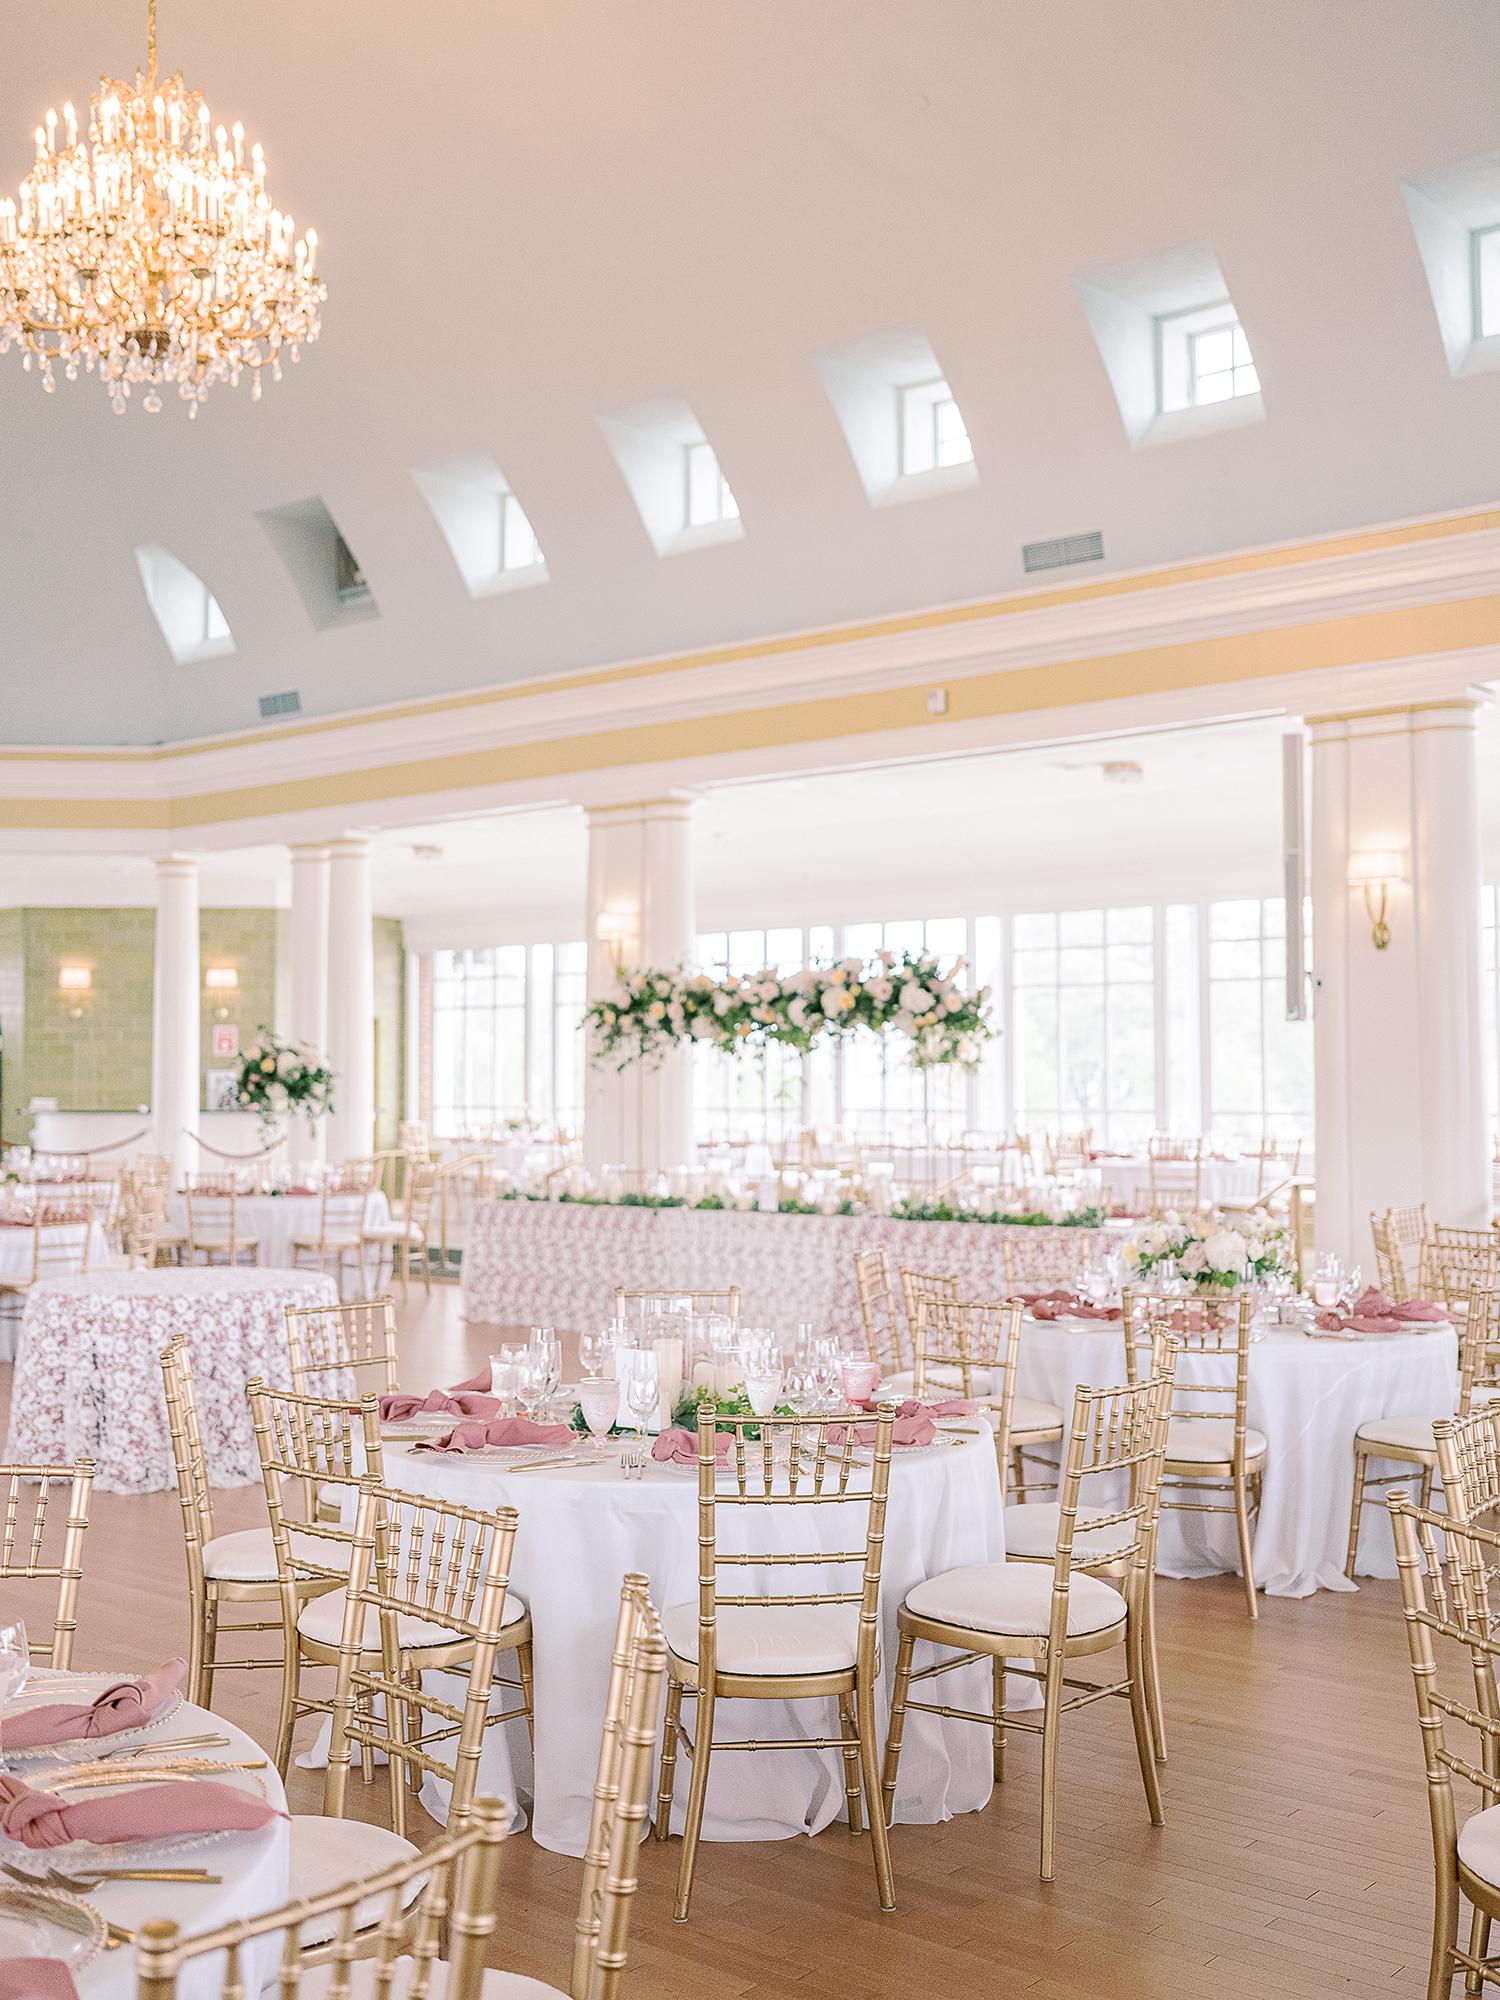 Christina Dusty Rose and Gold Wedding Ballroom Reception Clary Pfeiffer Photography